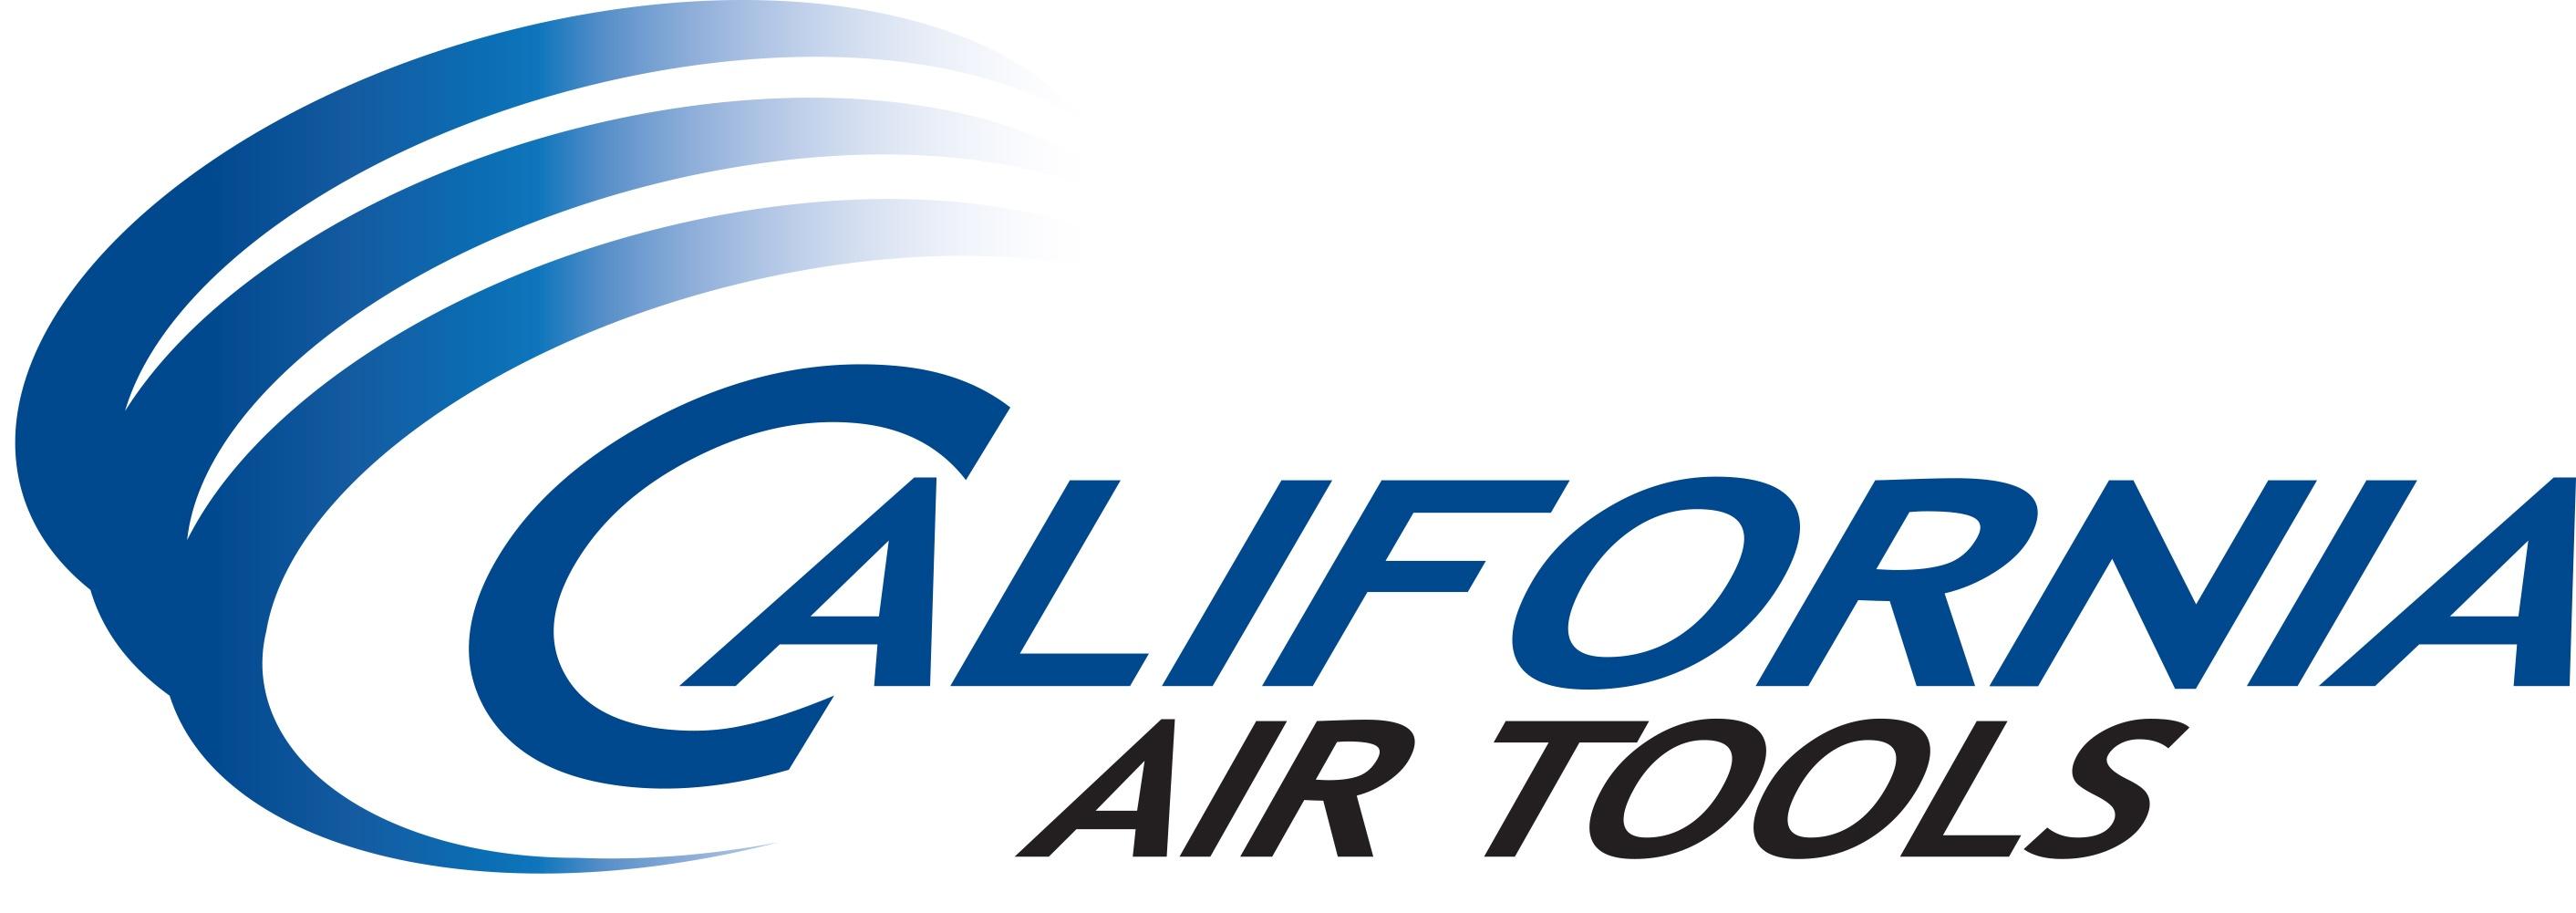 Made-in-California-manufacturer-California-Air-Tools-Logo.jpg